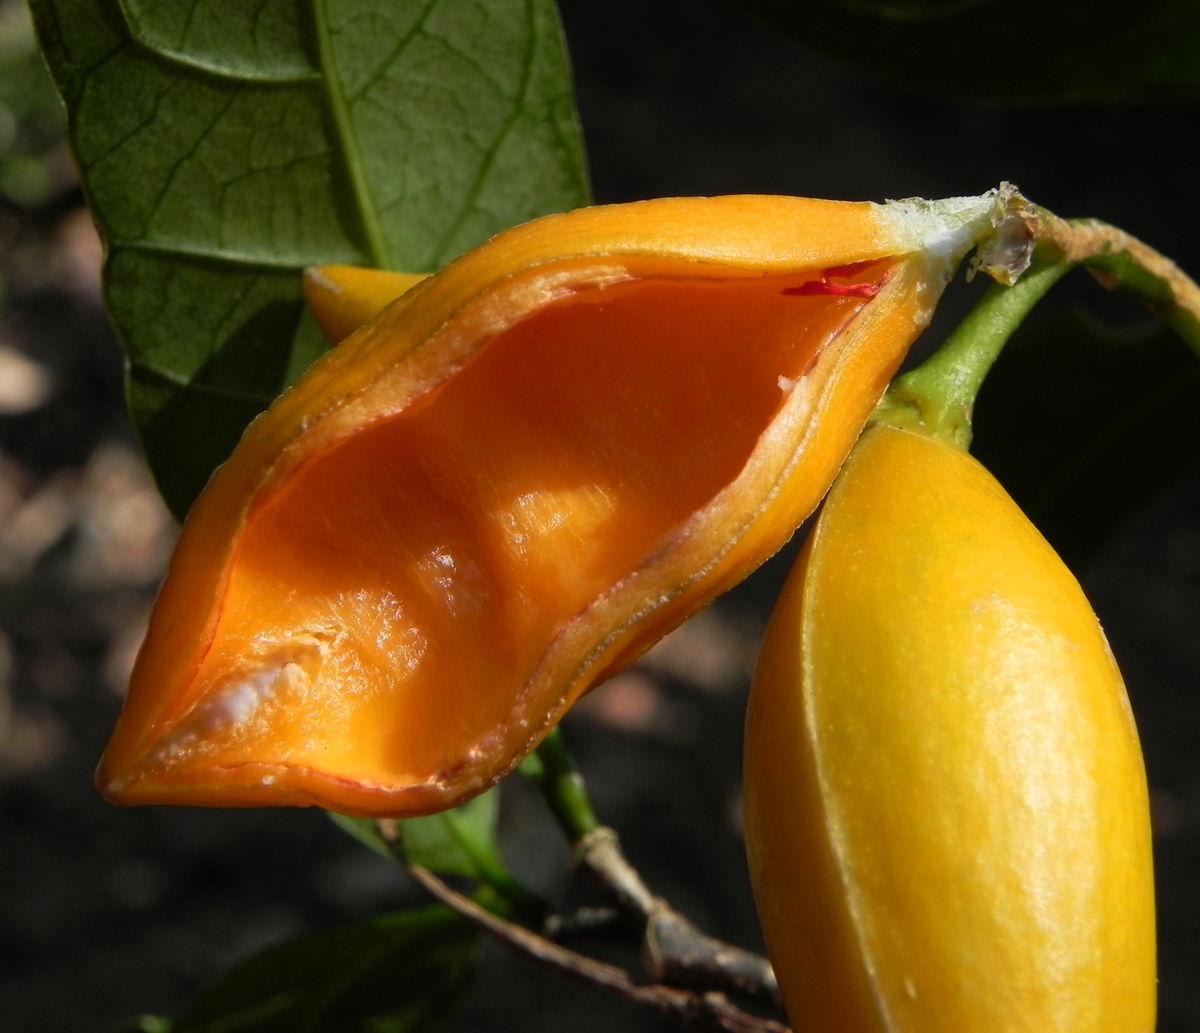 Bananenbusch Frucht orange Tabernaemontana pandacaqui